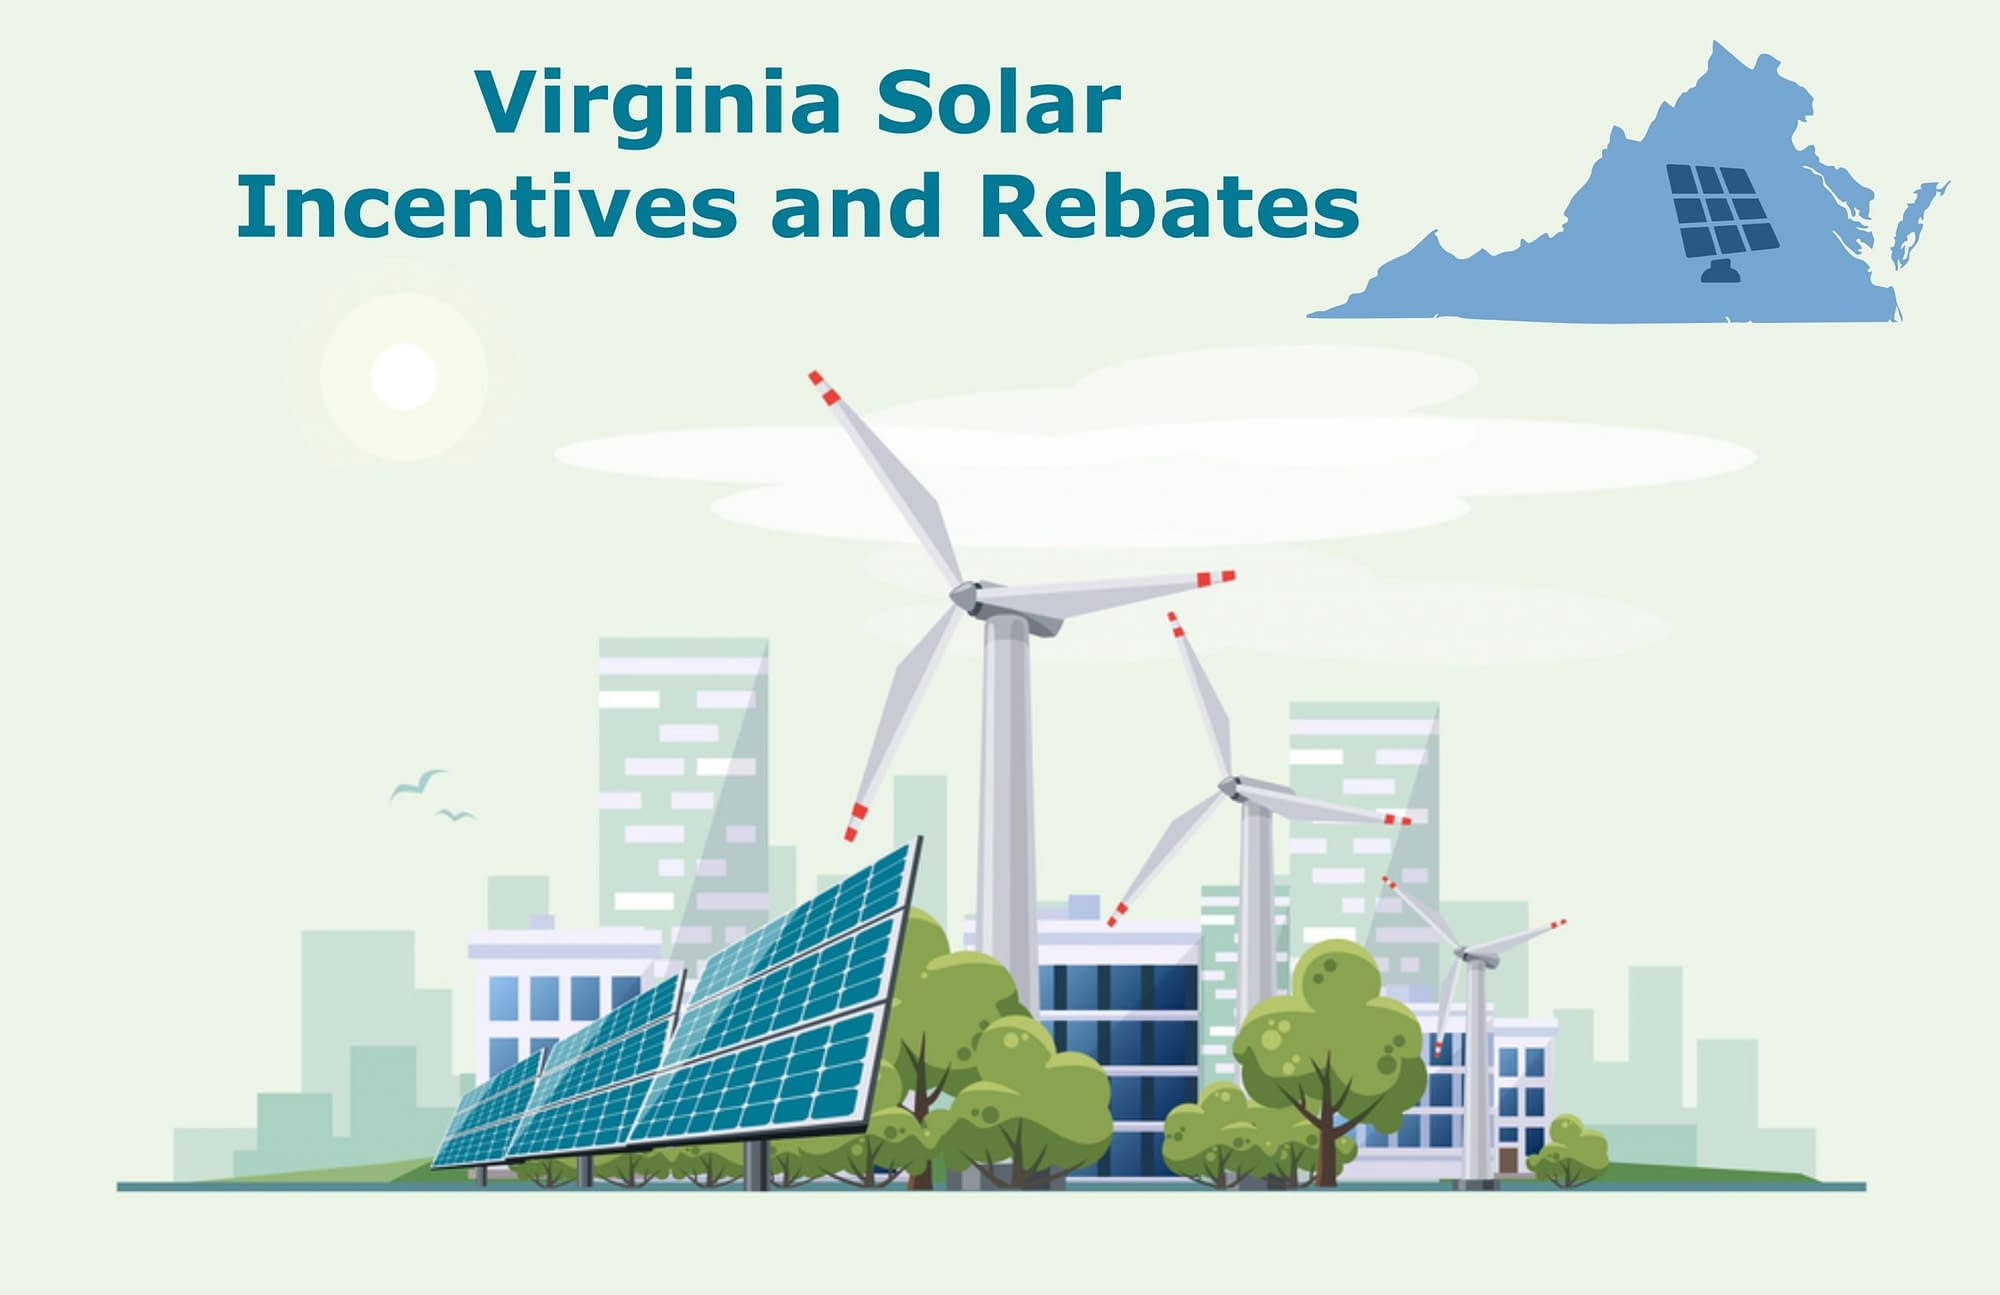 Virginia Solar Incentives and Rebates